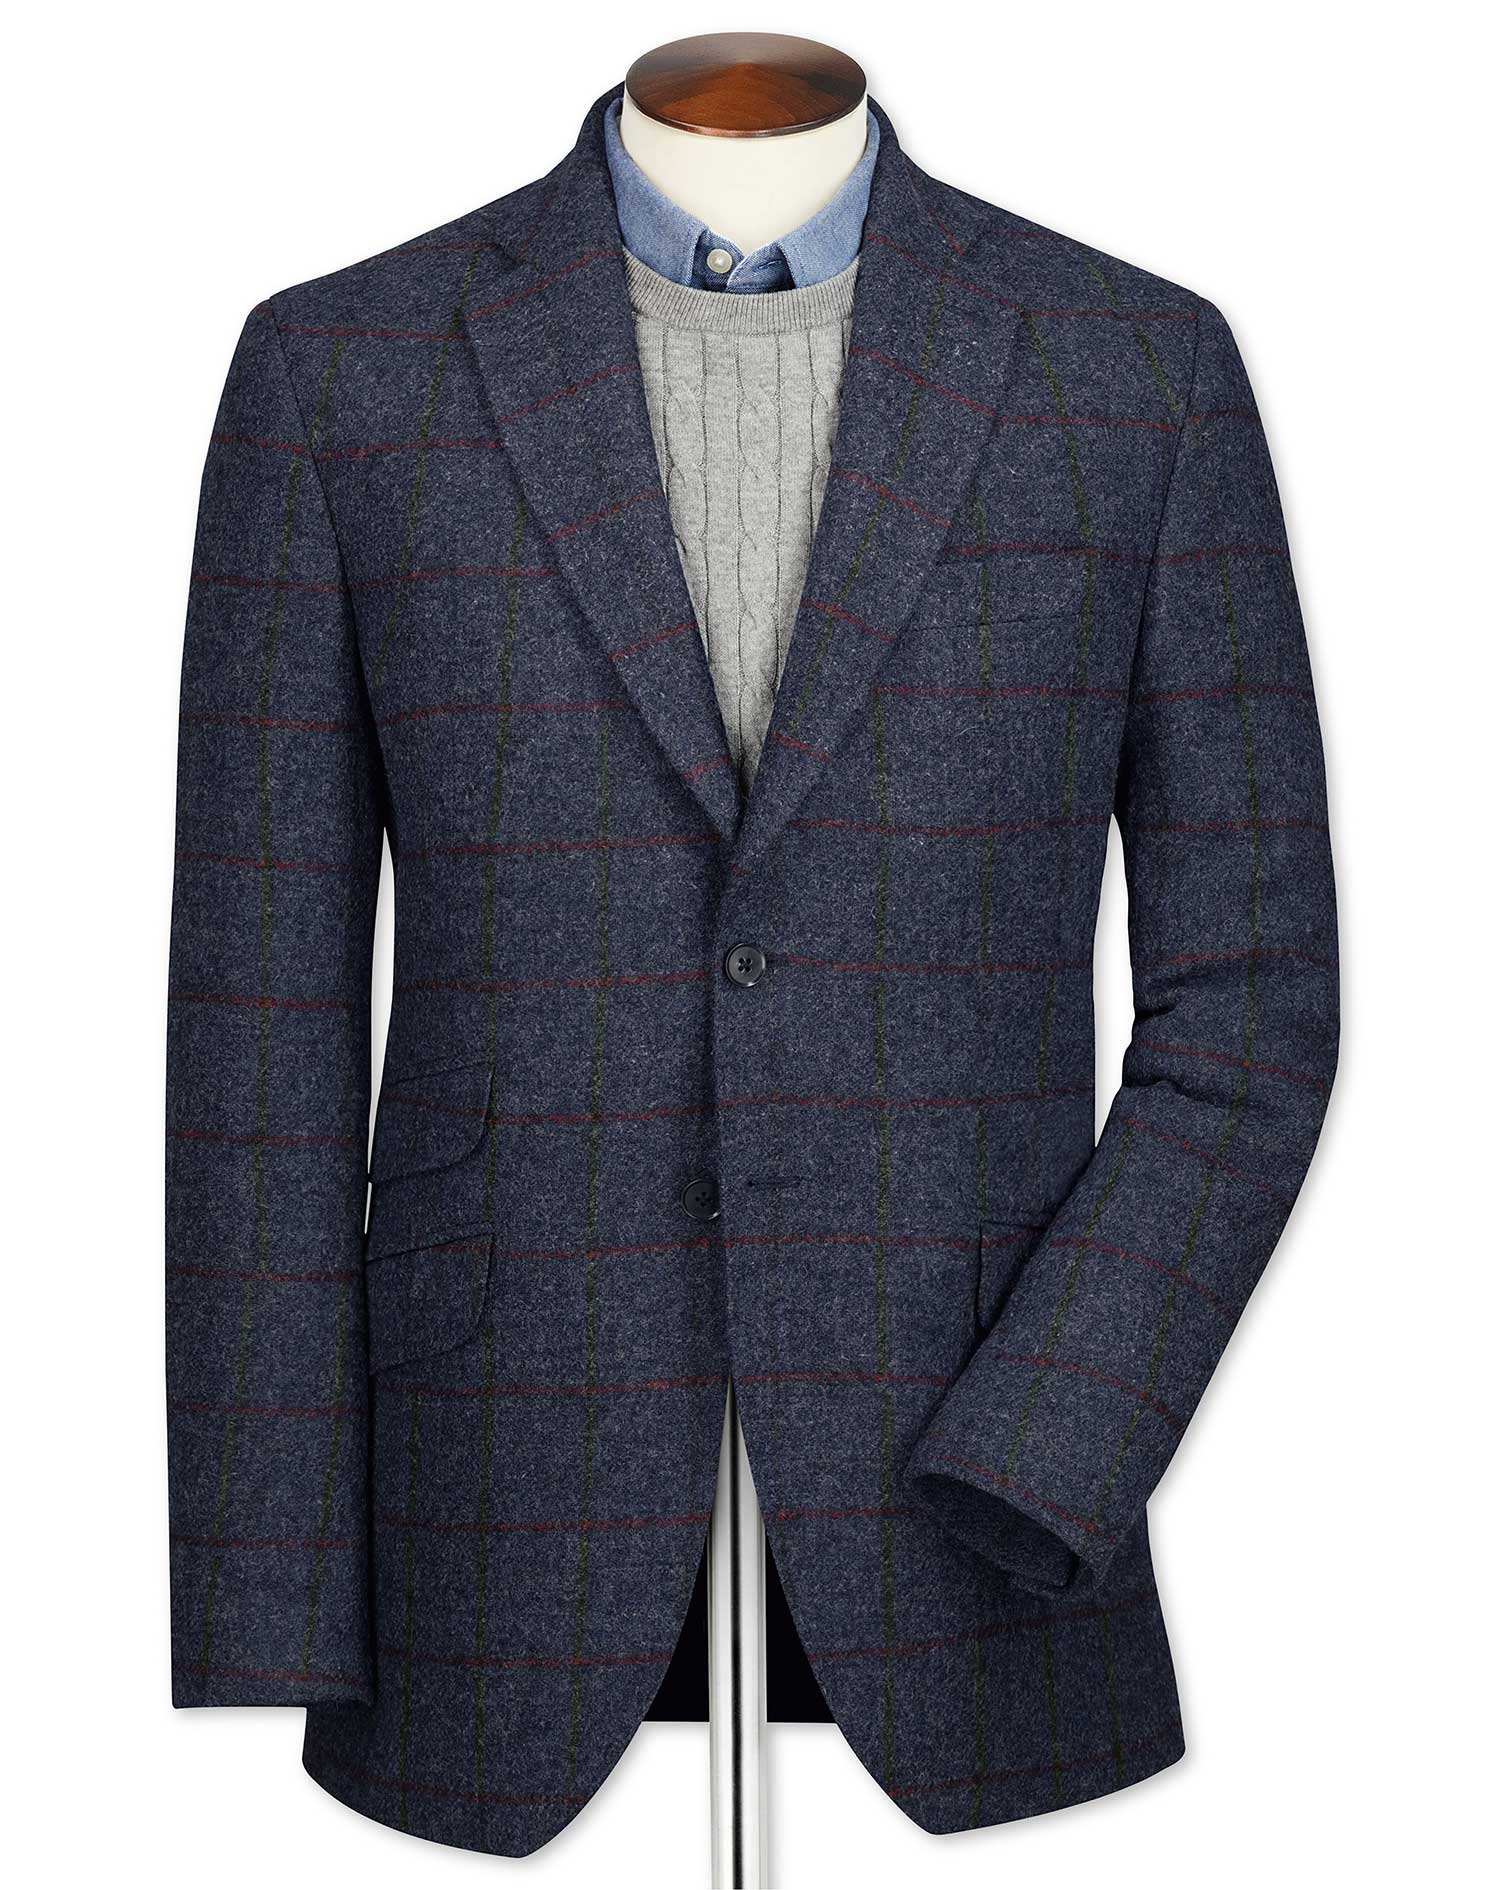 Slim Fit Navy Checkered British Tweed Wool Jacket Size 38 Regular by Charles Tyrwhitt